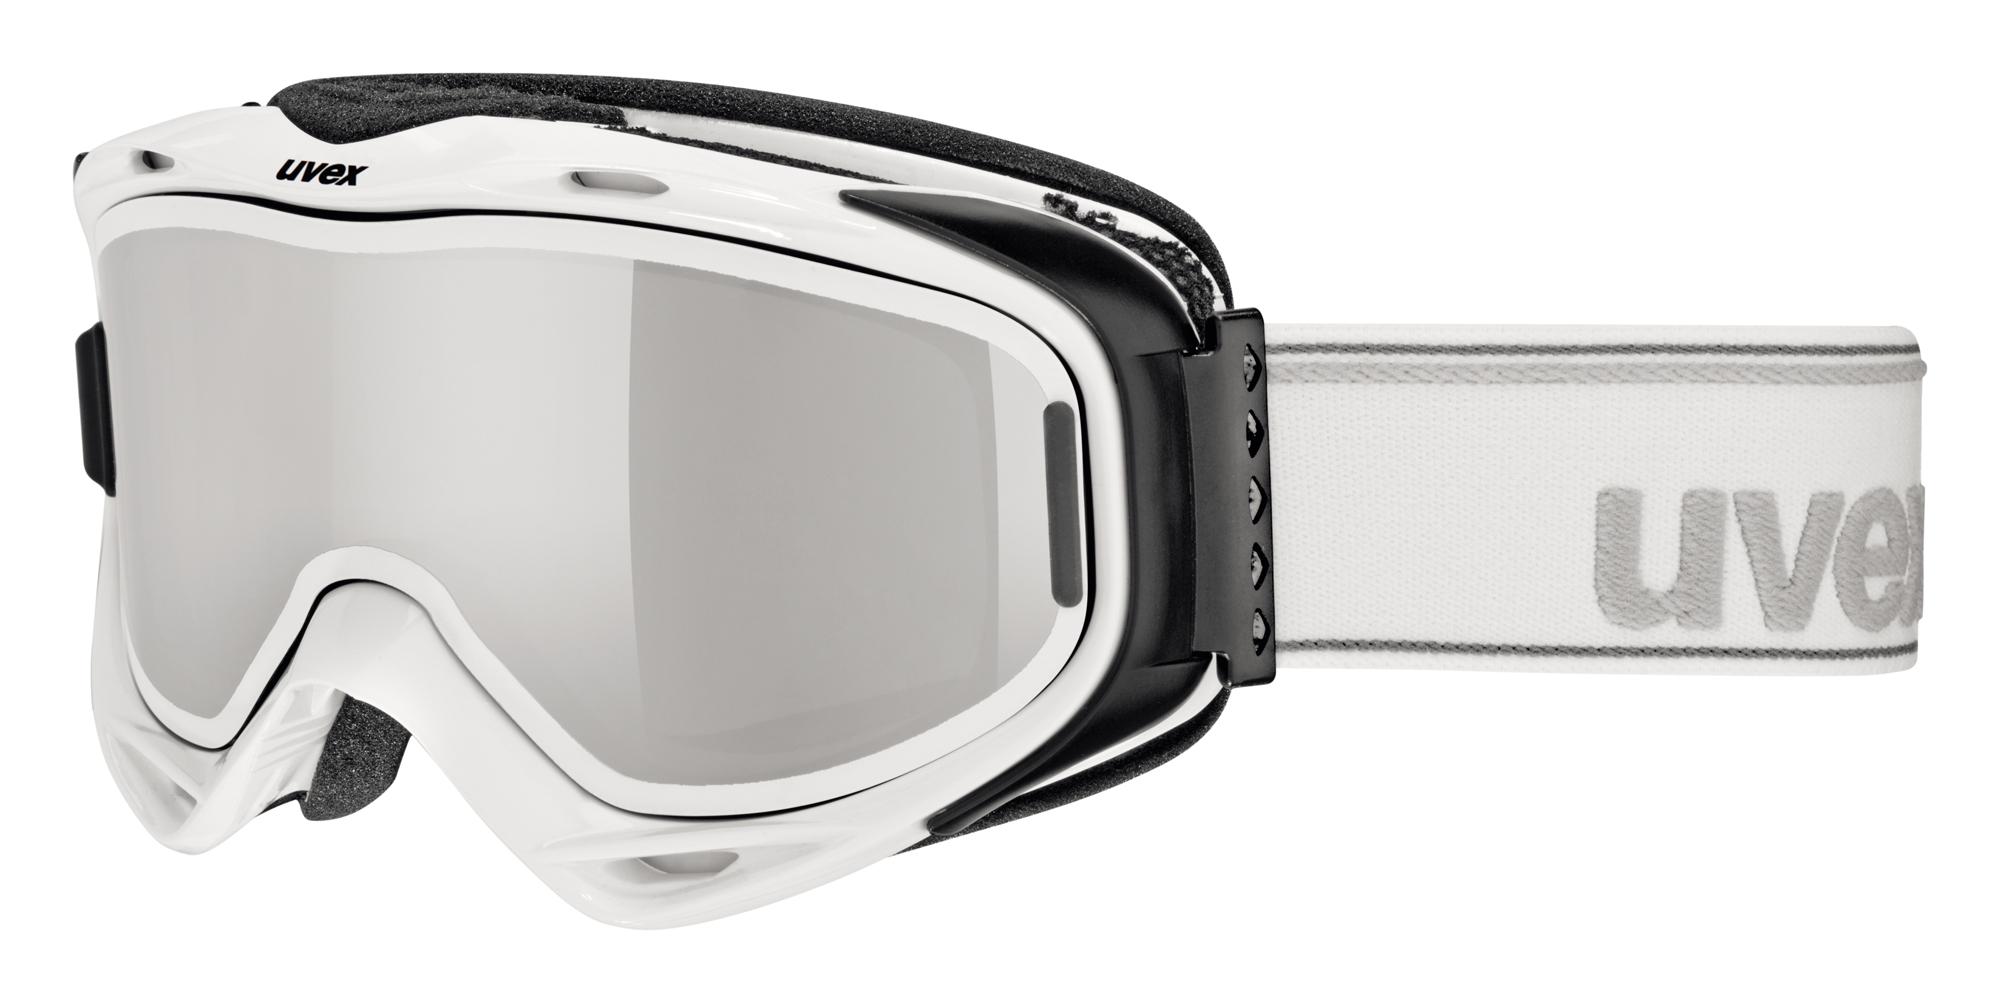 UVEX G.GL 300 TAKE OFF, white/litemirror silver S5502131026